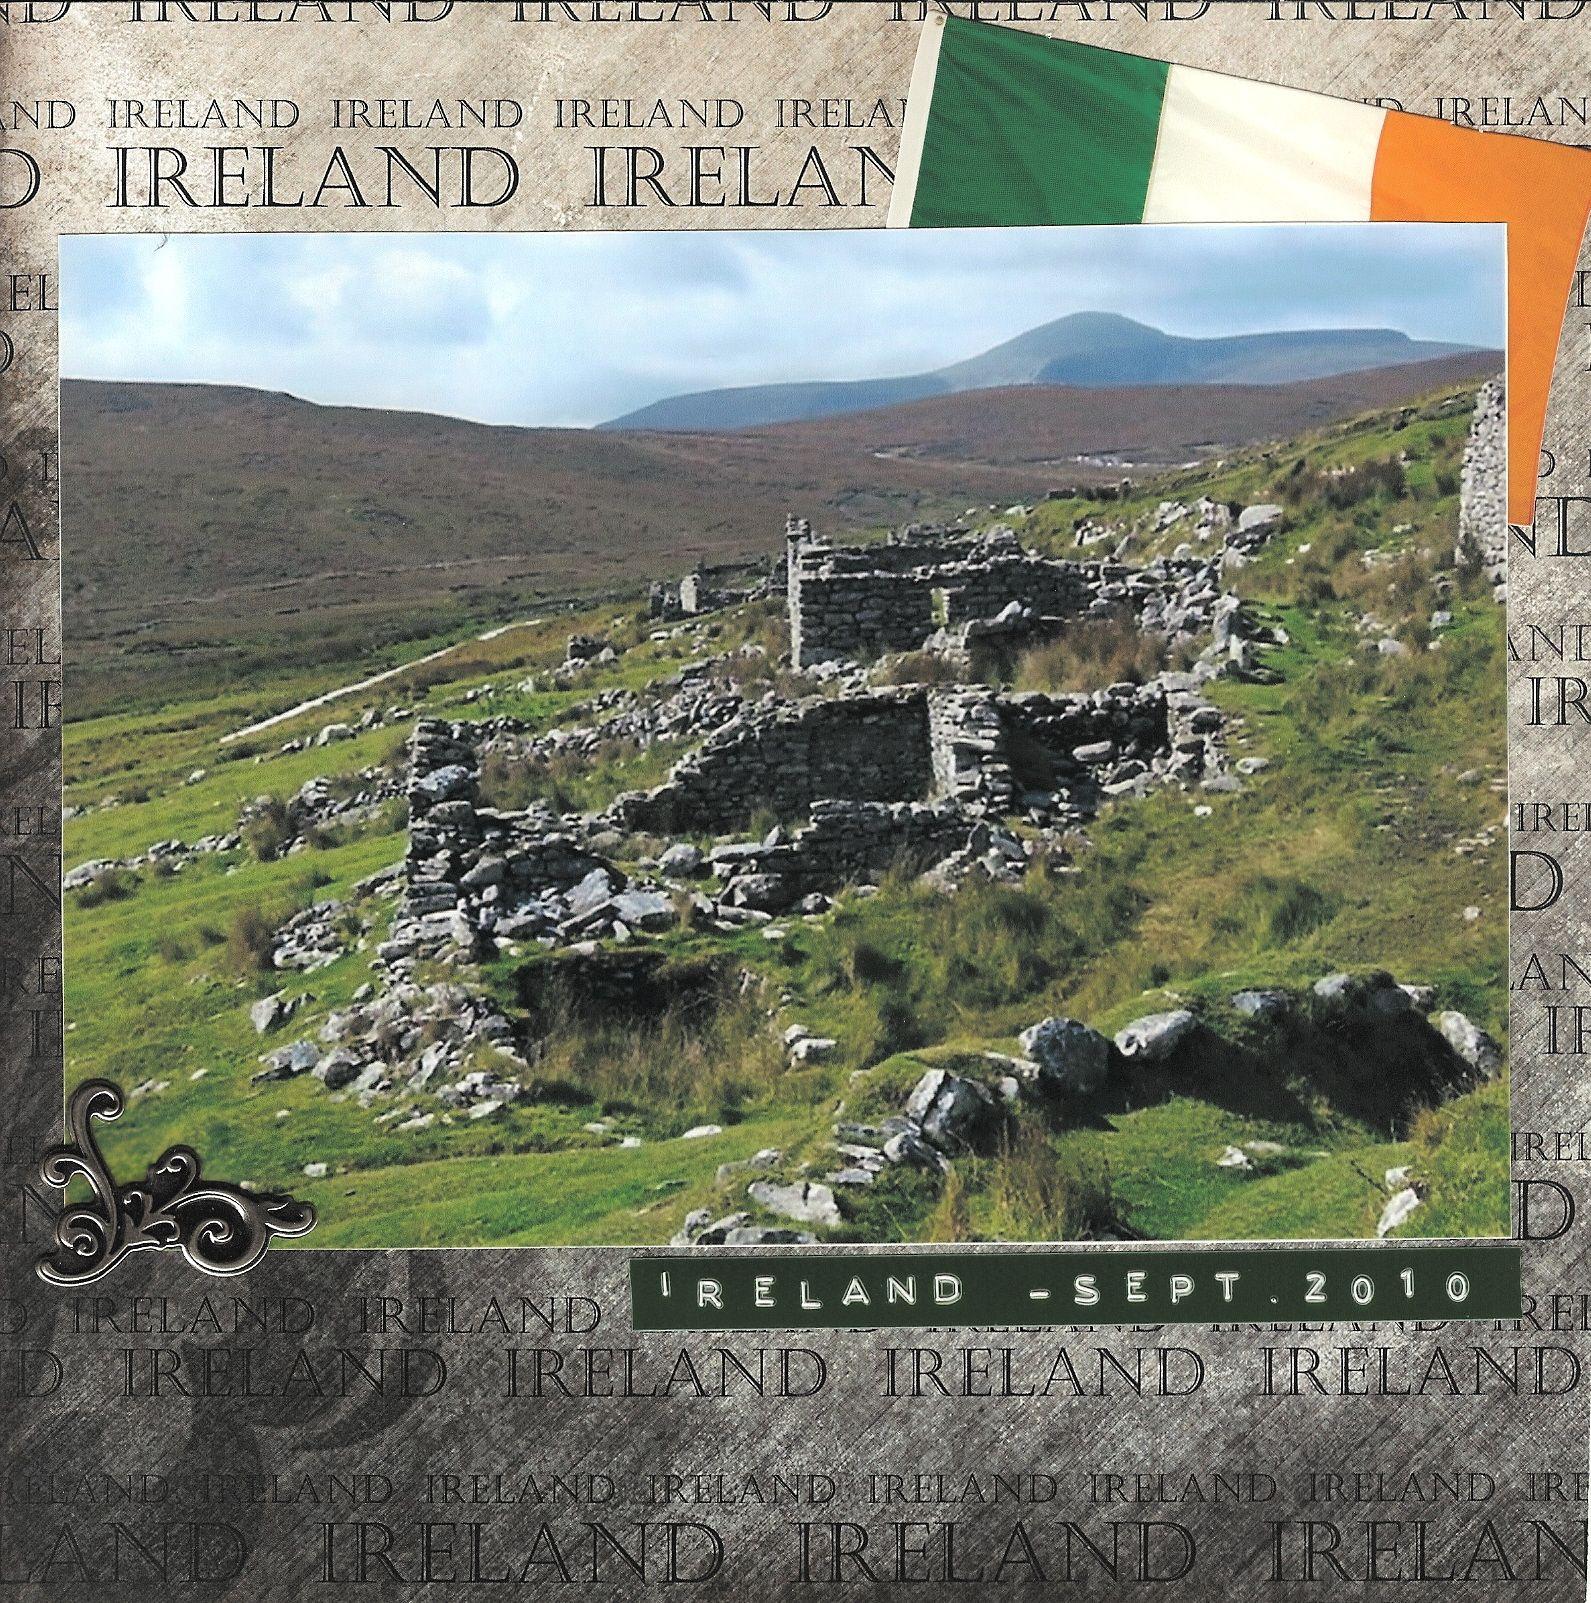 How to scrapbook 8x8 layouts - 8x8 Scrapbook Layout Ireland Album Page 1